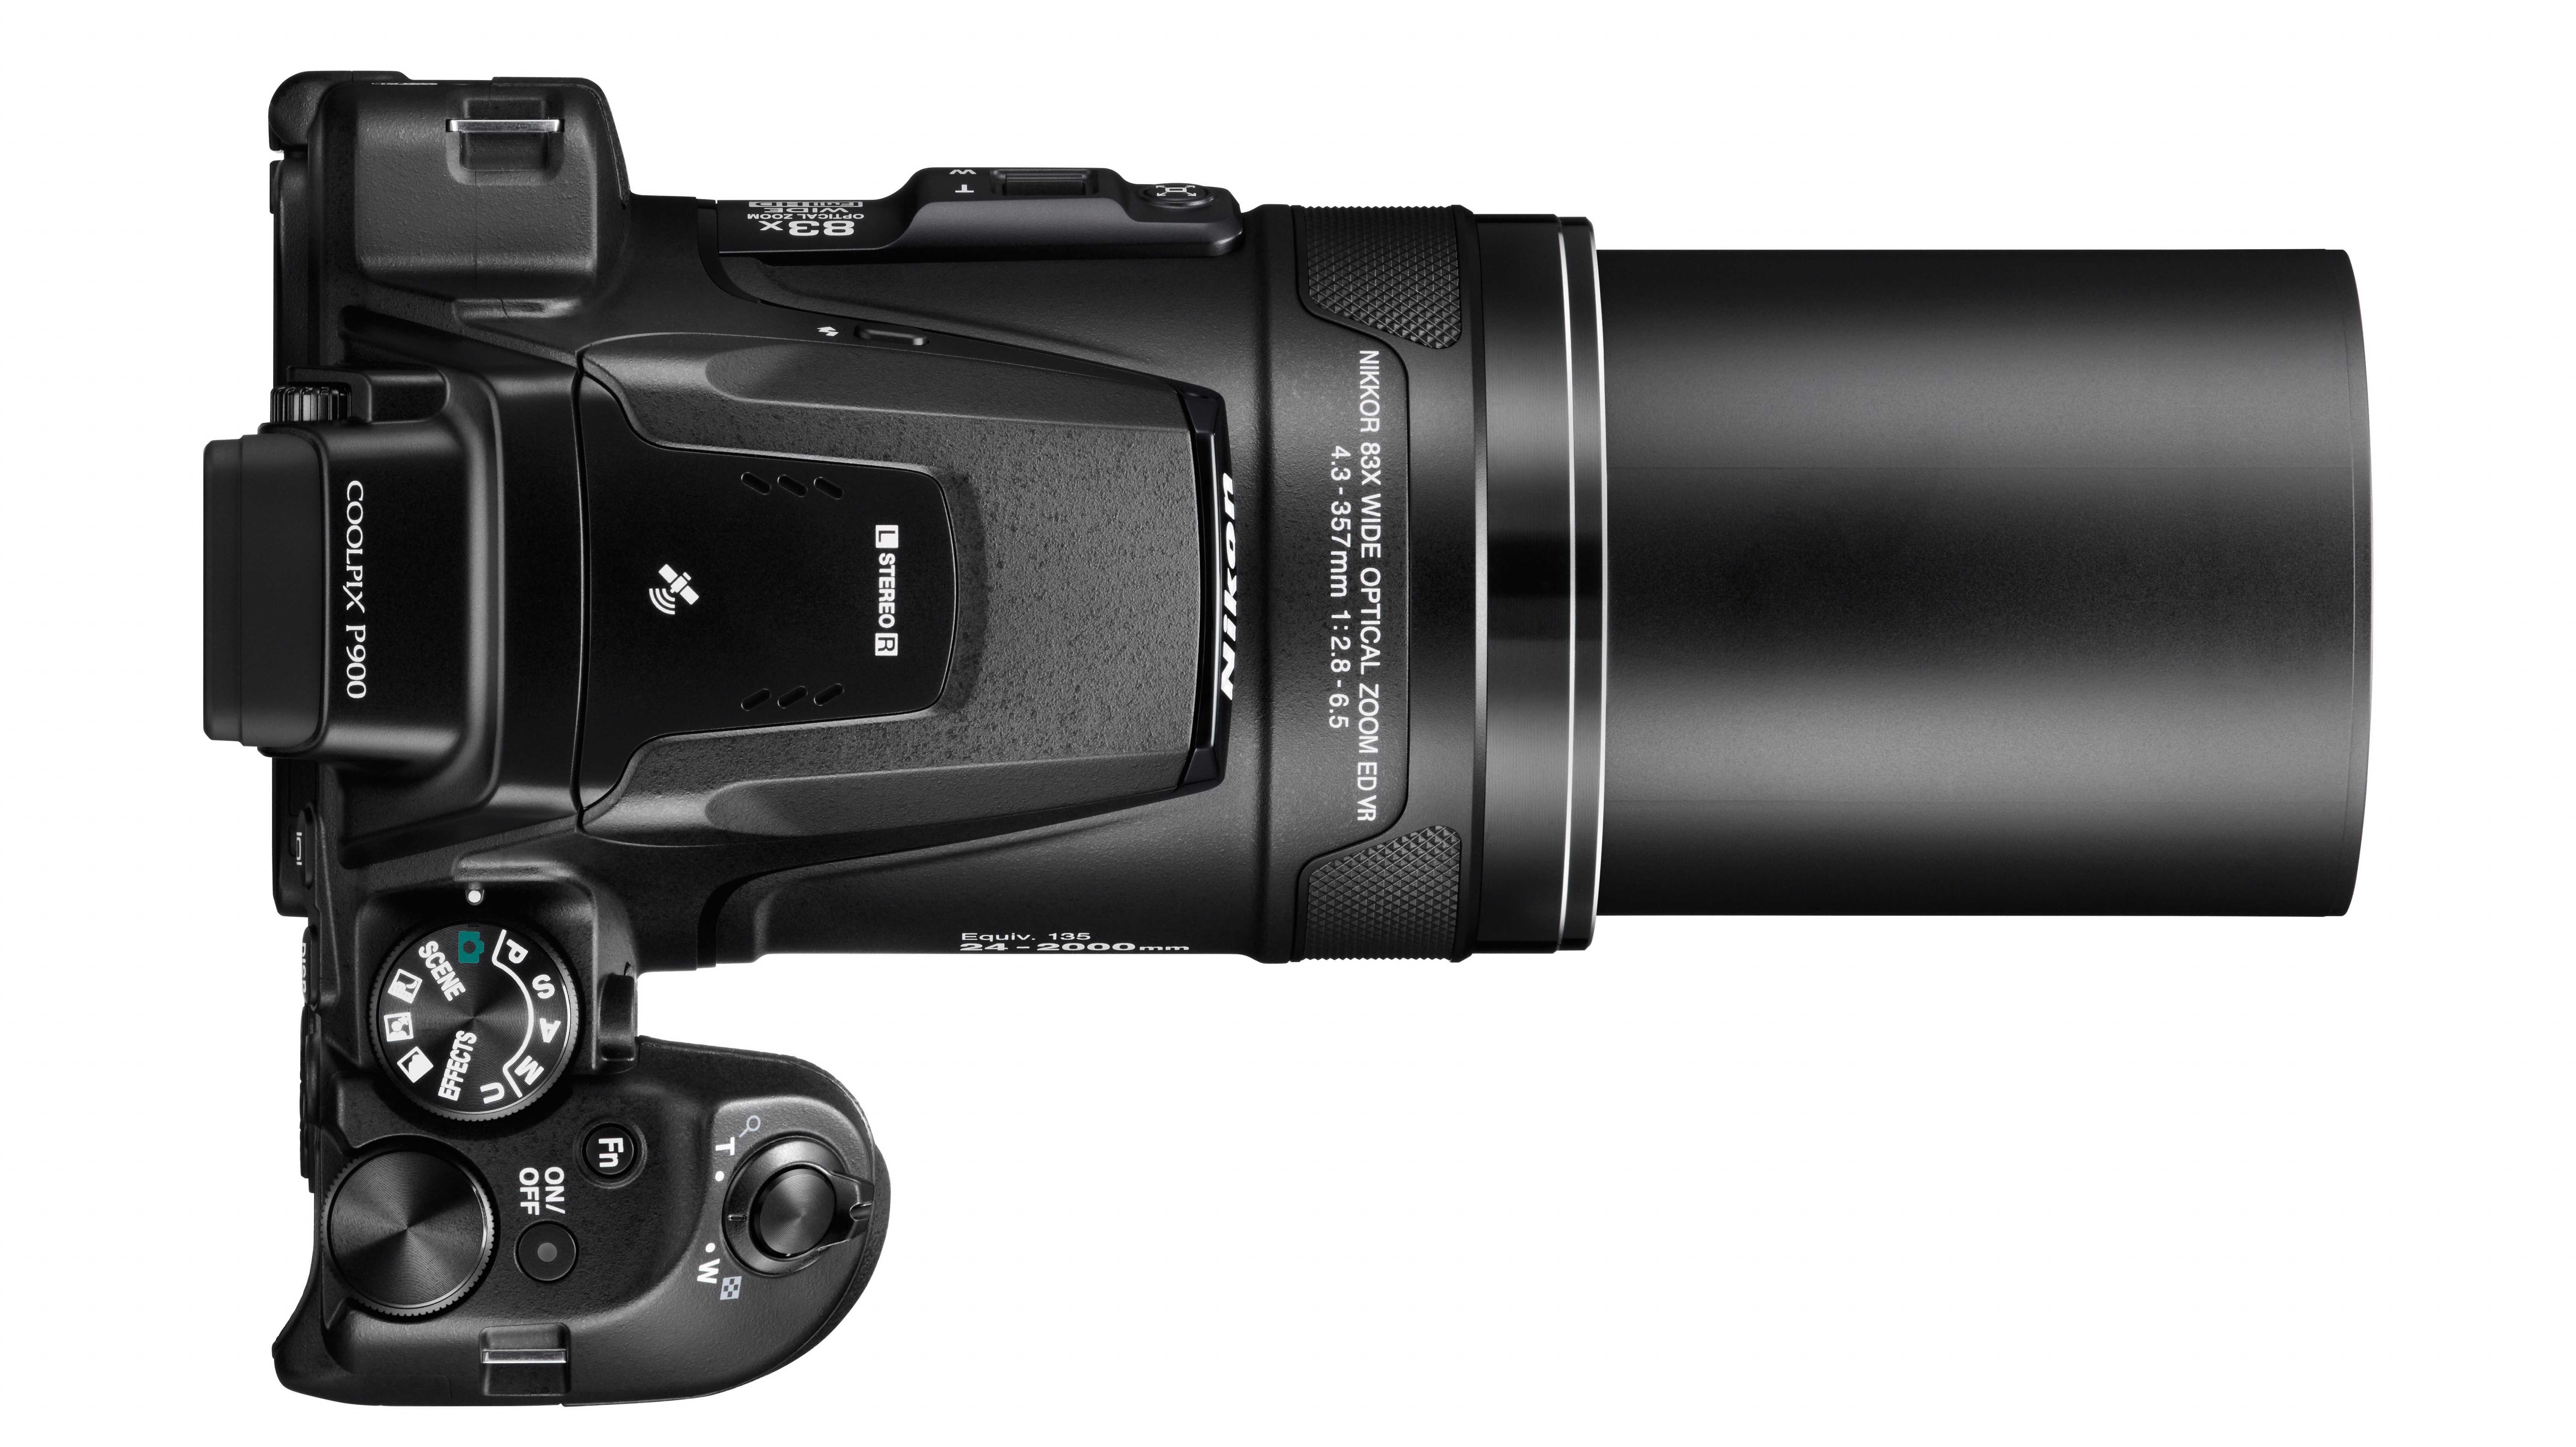 Mondfotos mit 2000 millimetern: bridge kamera nikon coolpix p900 mit